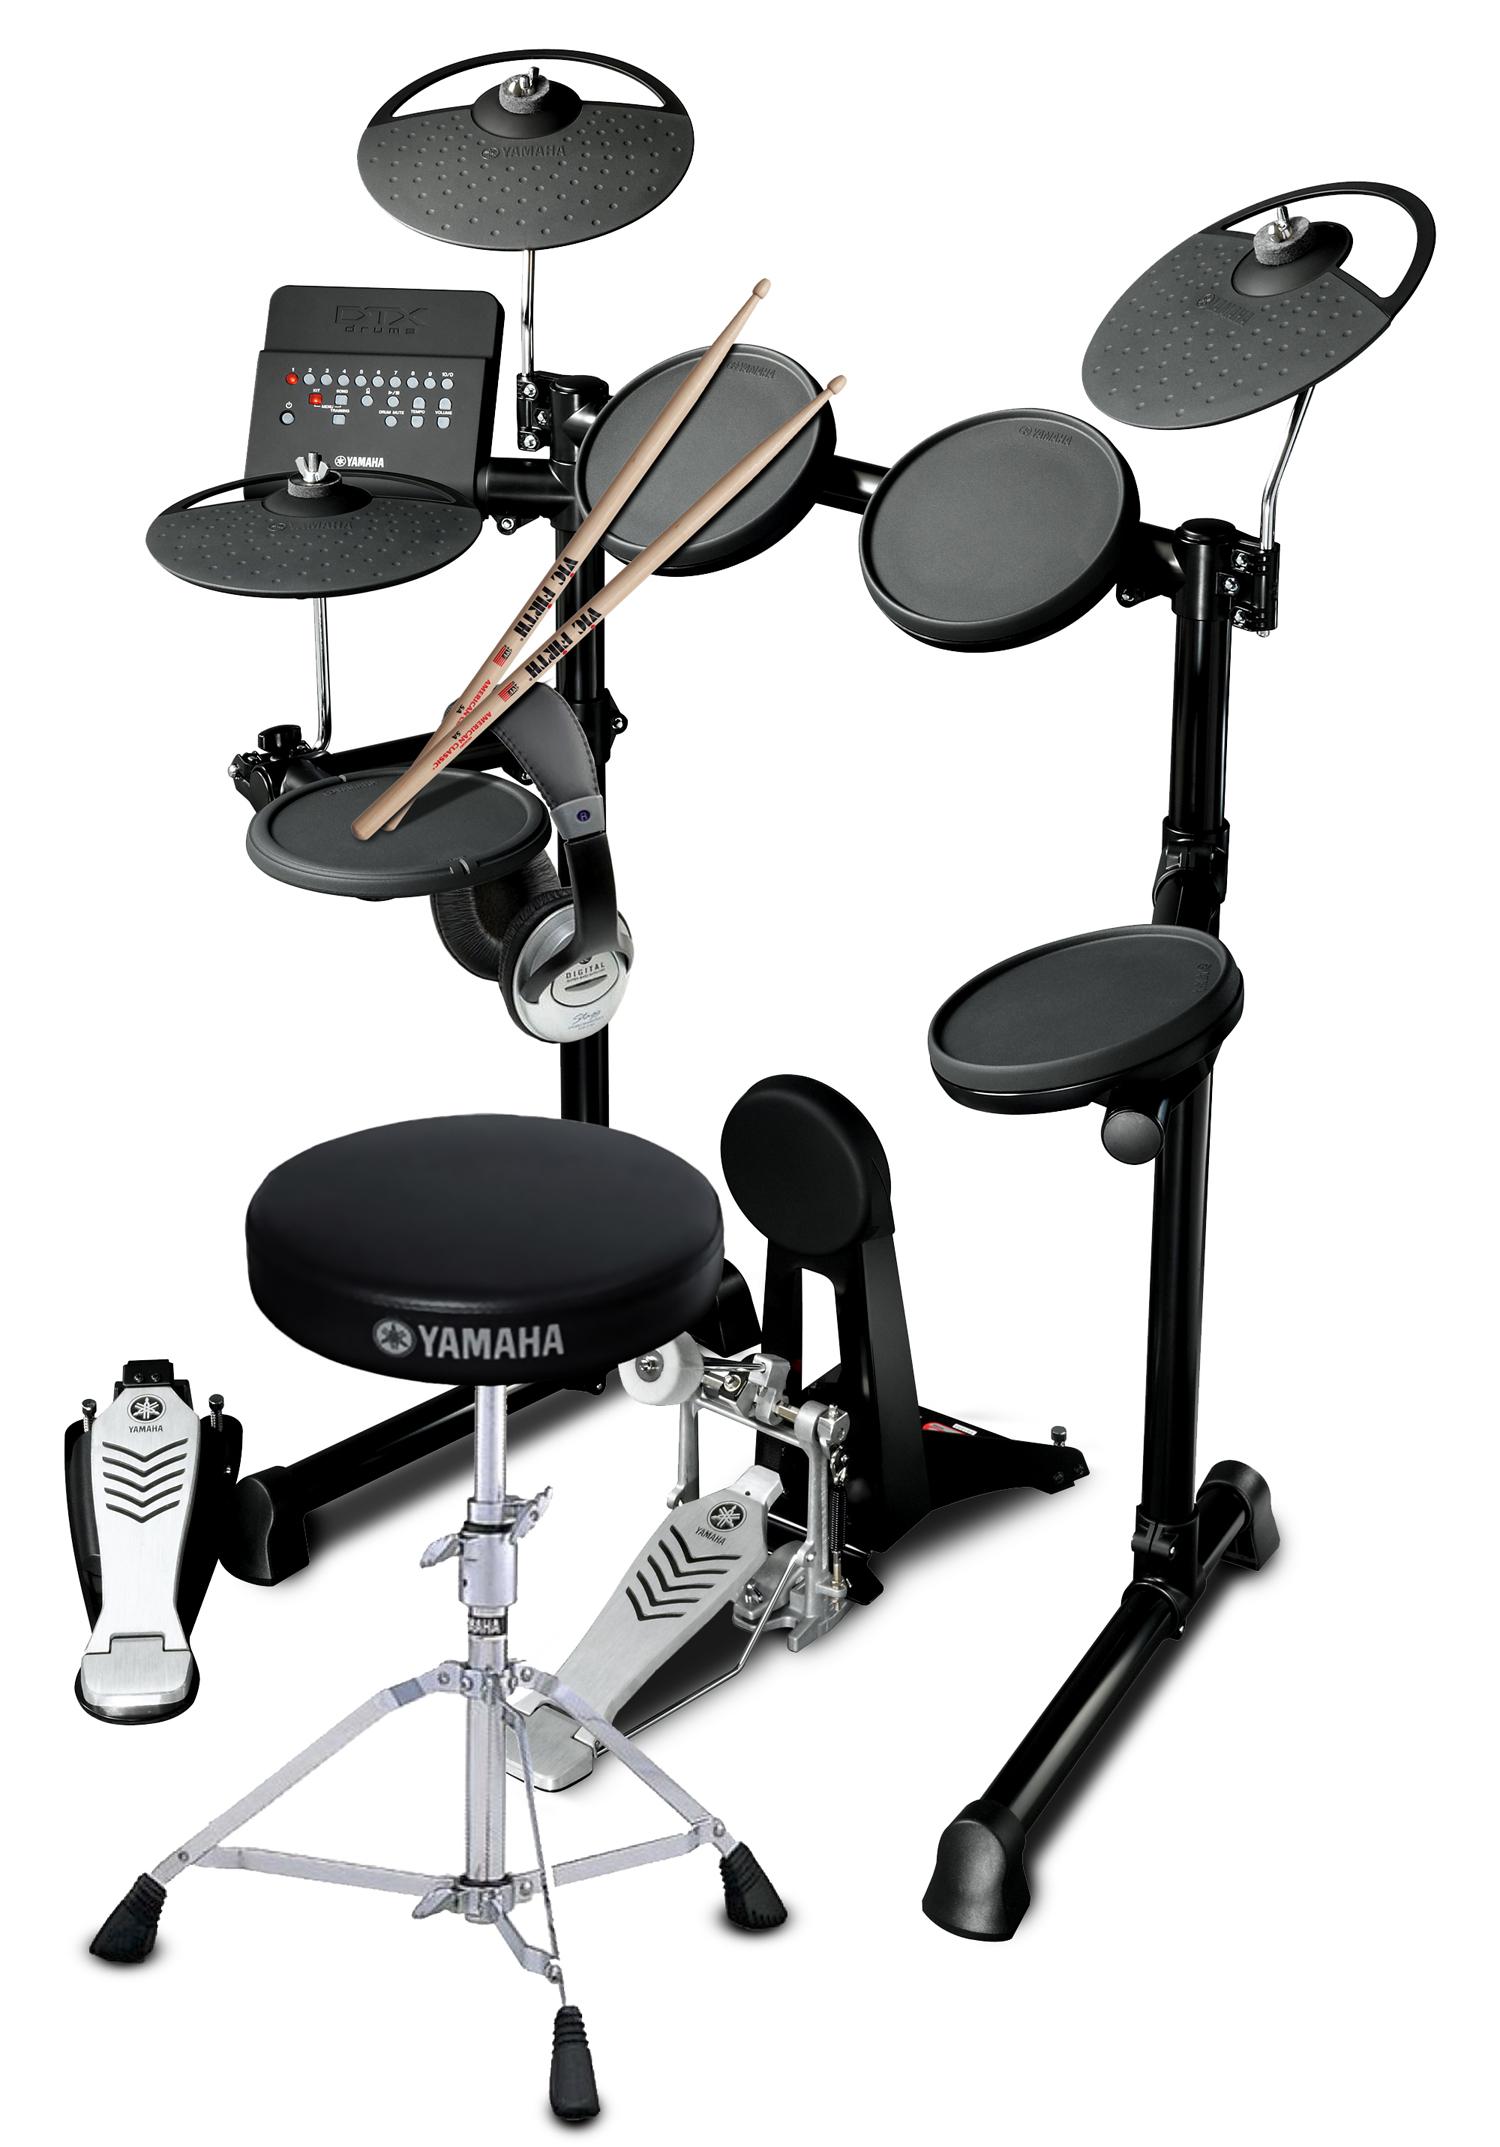 yamaha maverick beginner drum pack featuring the yamaha dtx450k electronic drum kit yamaha. Black Bedroom Furniture Sets. Home Design Ideas